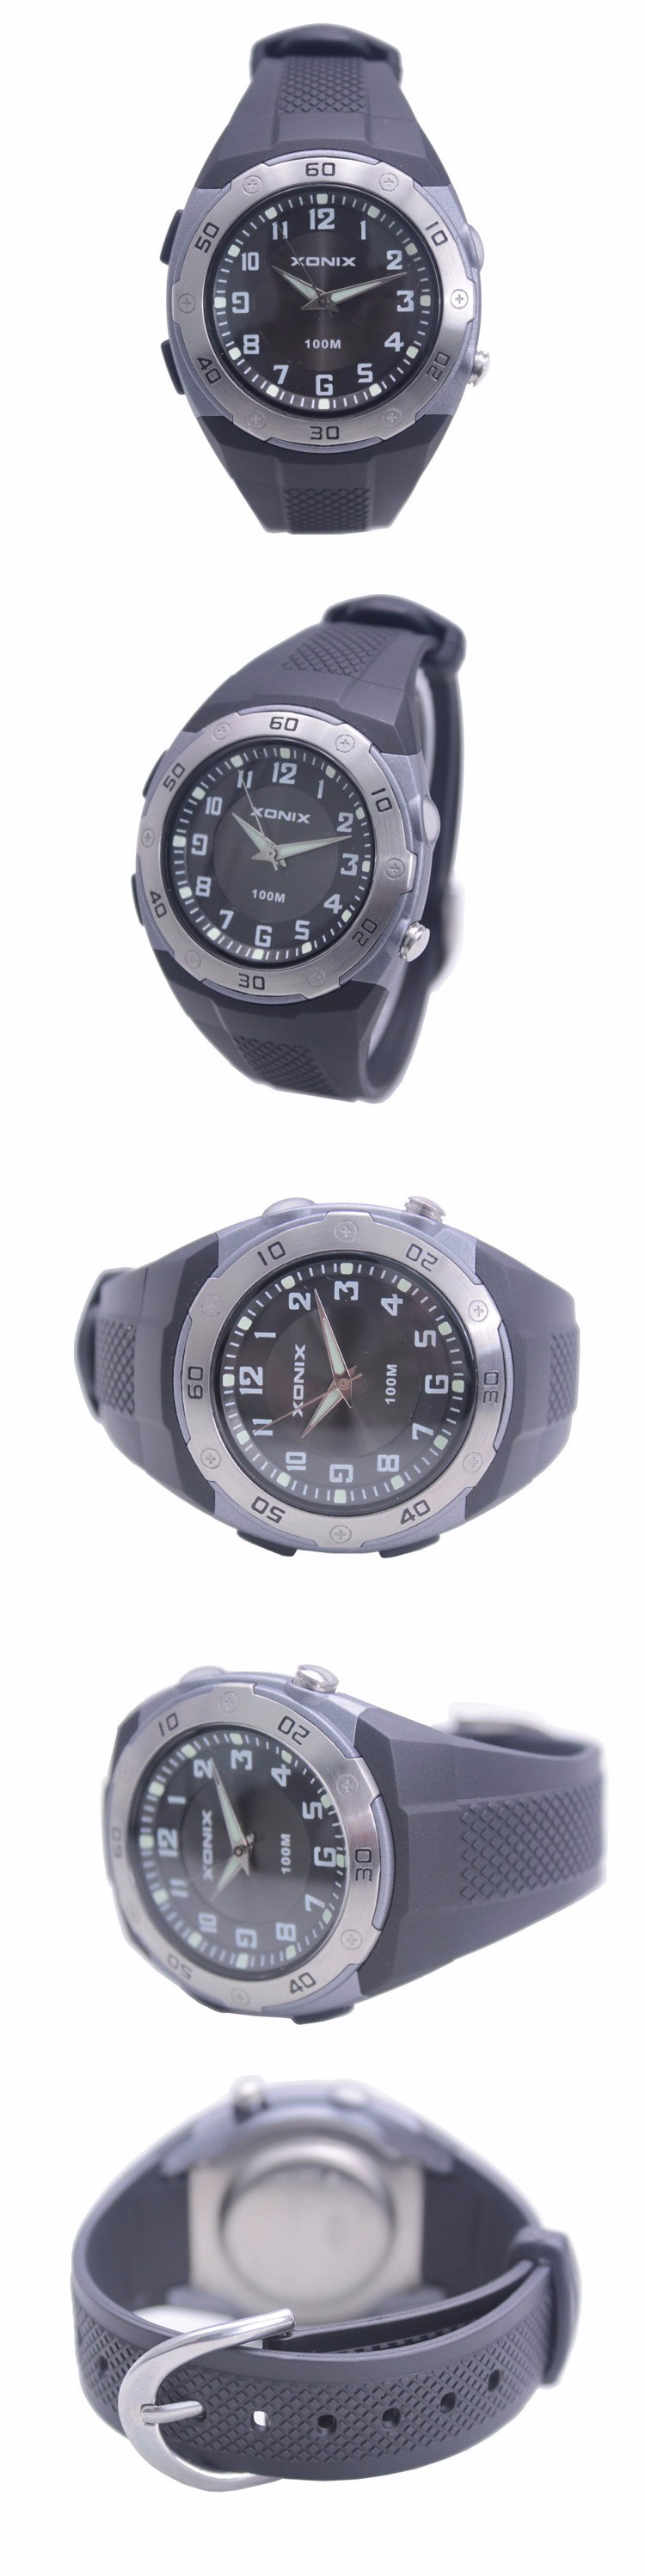 High Quality watch f